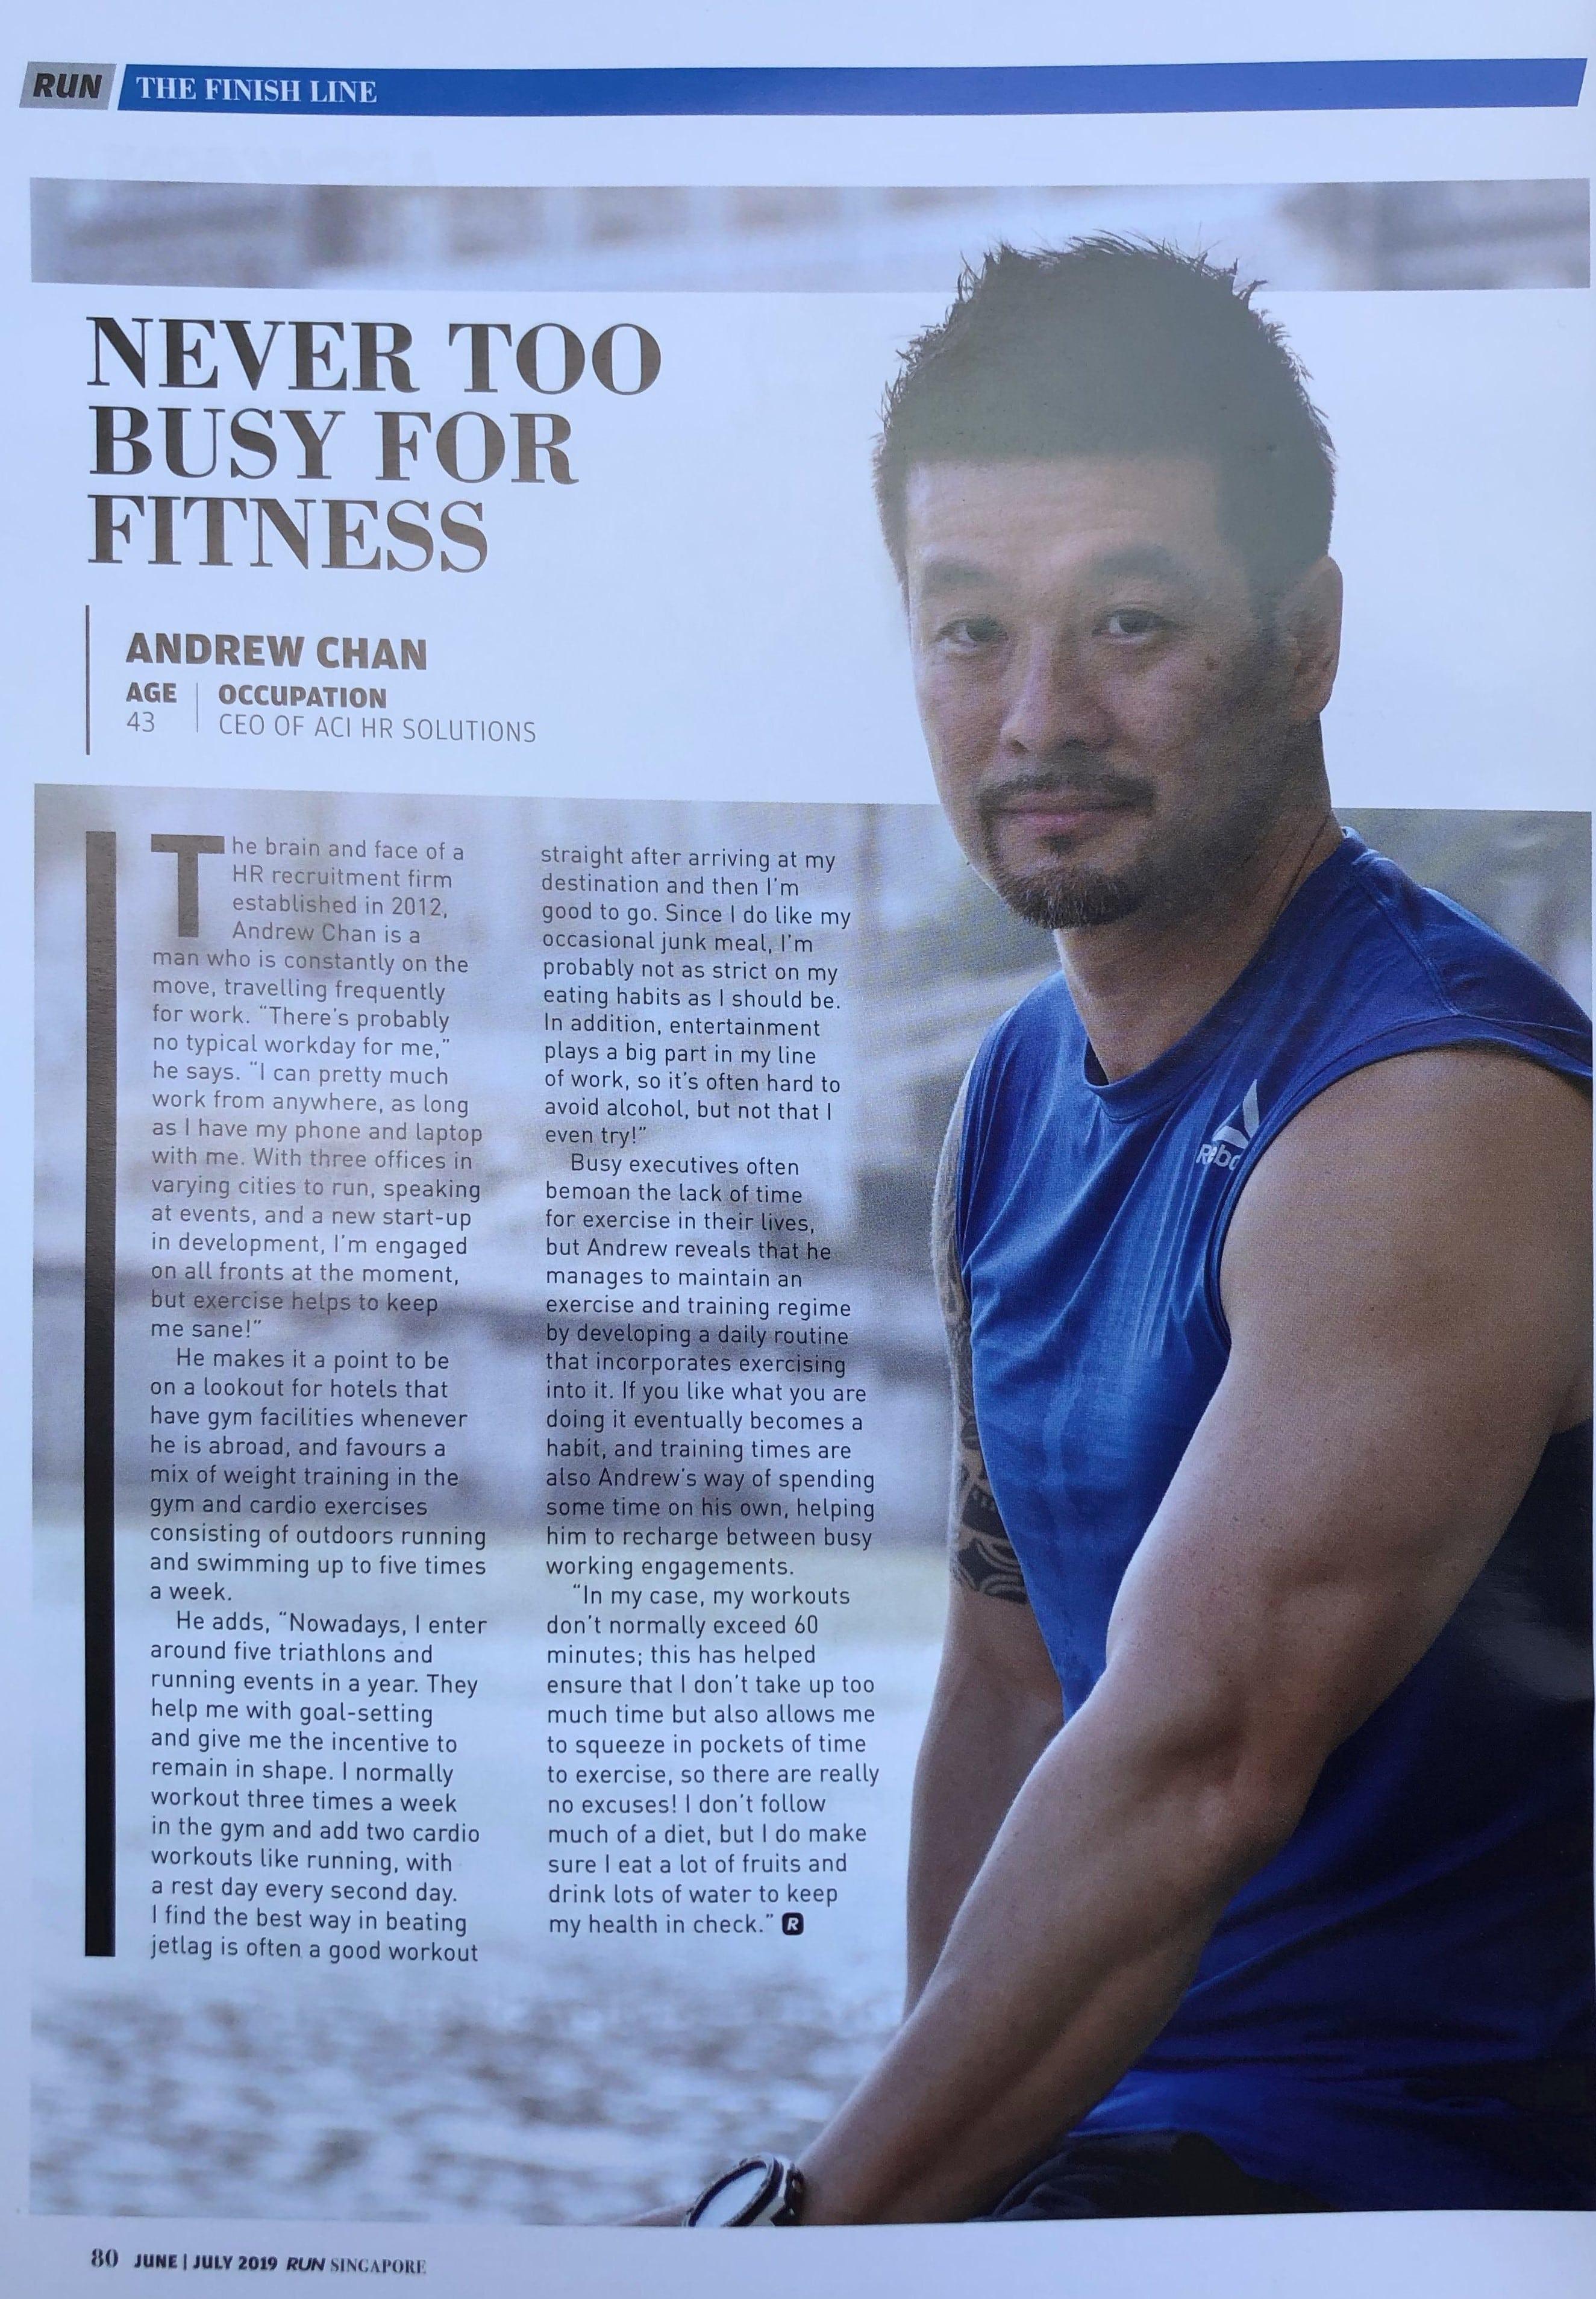 ANDREW CHAN - Media